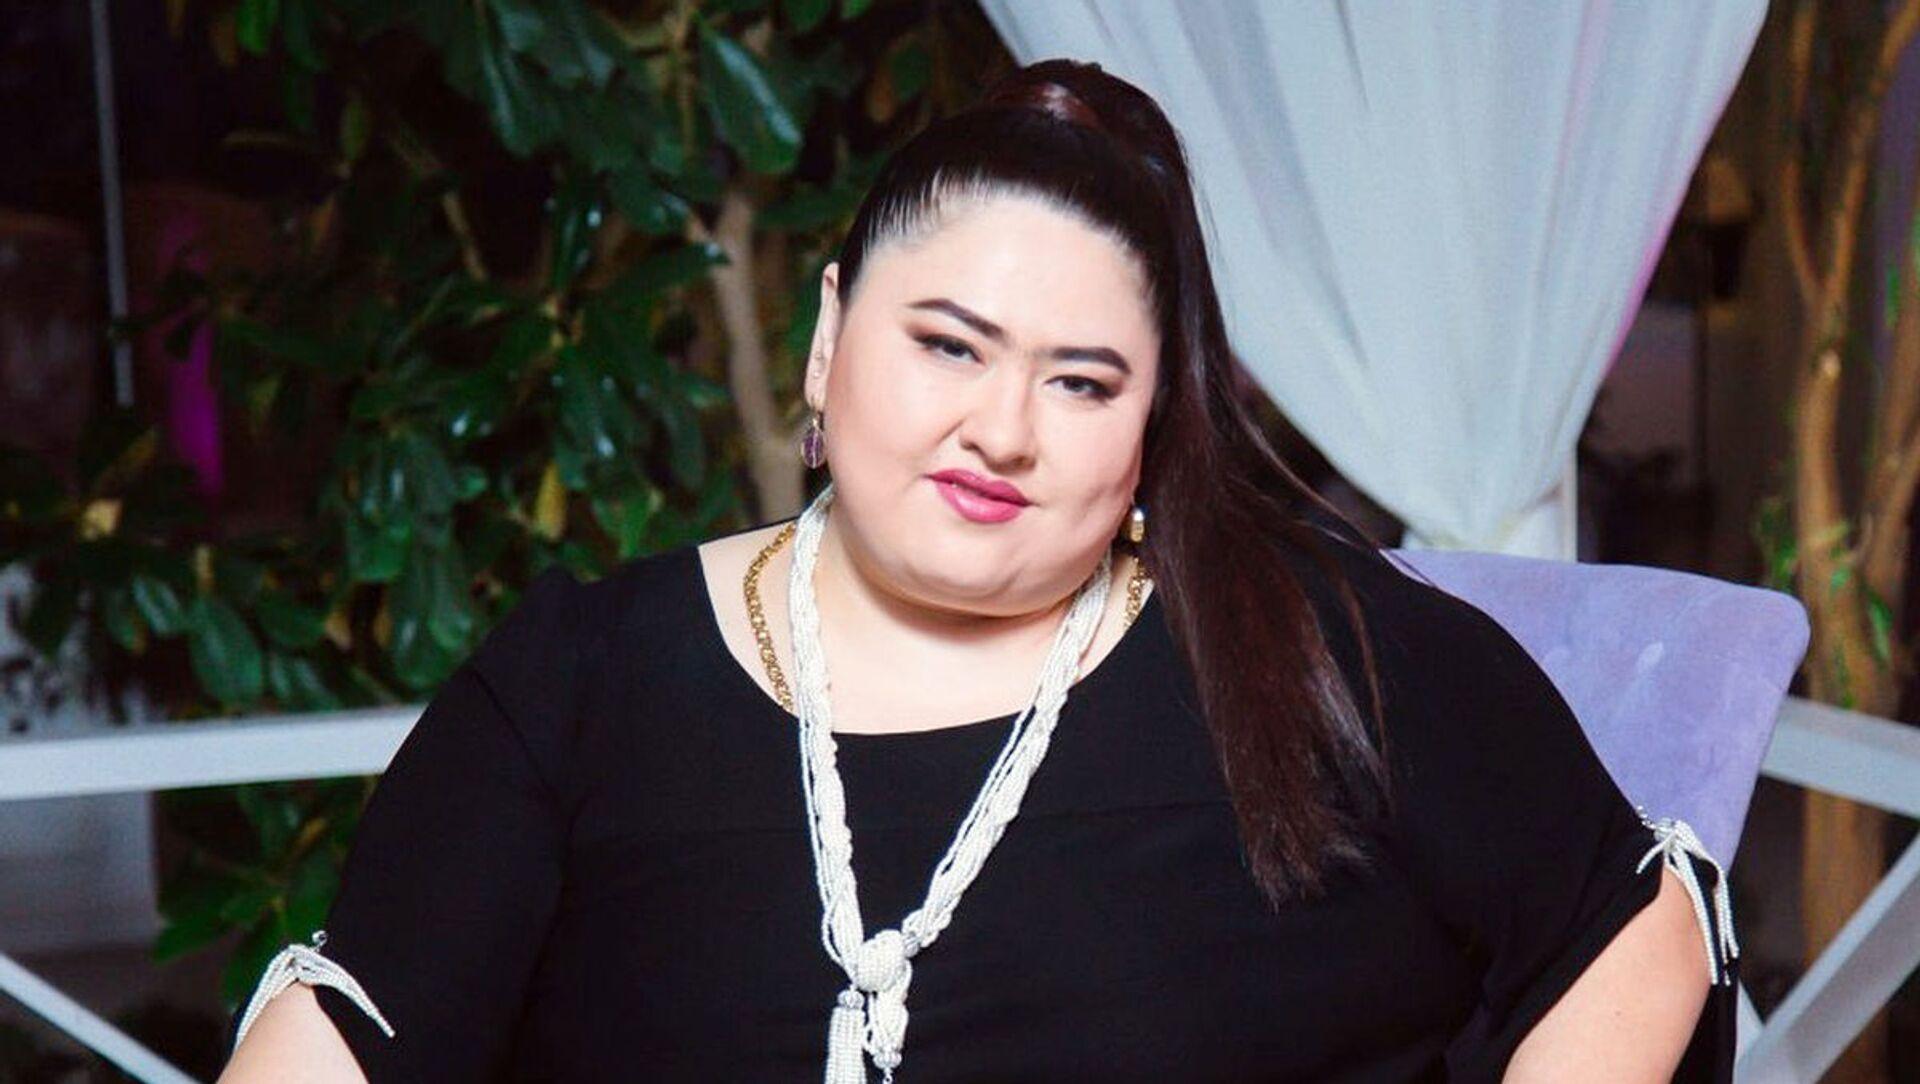 Узбекская актриса и юмористка Халима Ибрагимова - Sputnik Узбекистан, 1920, 16.02.2021